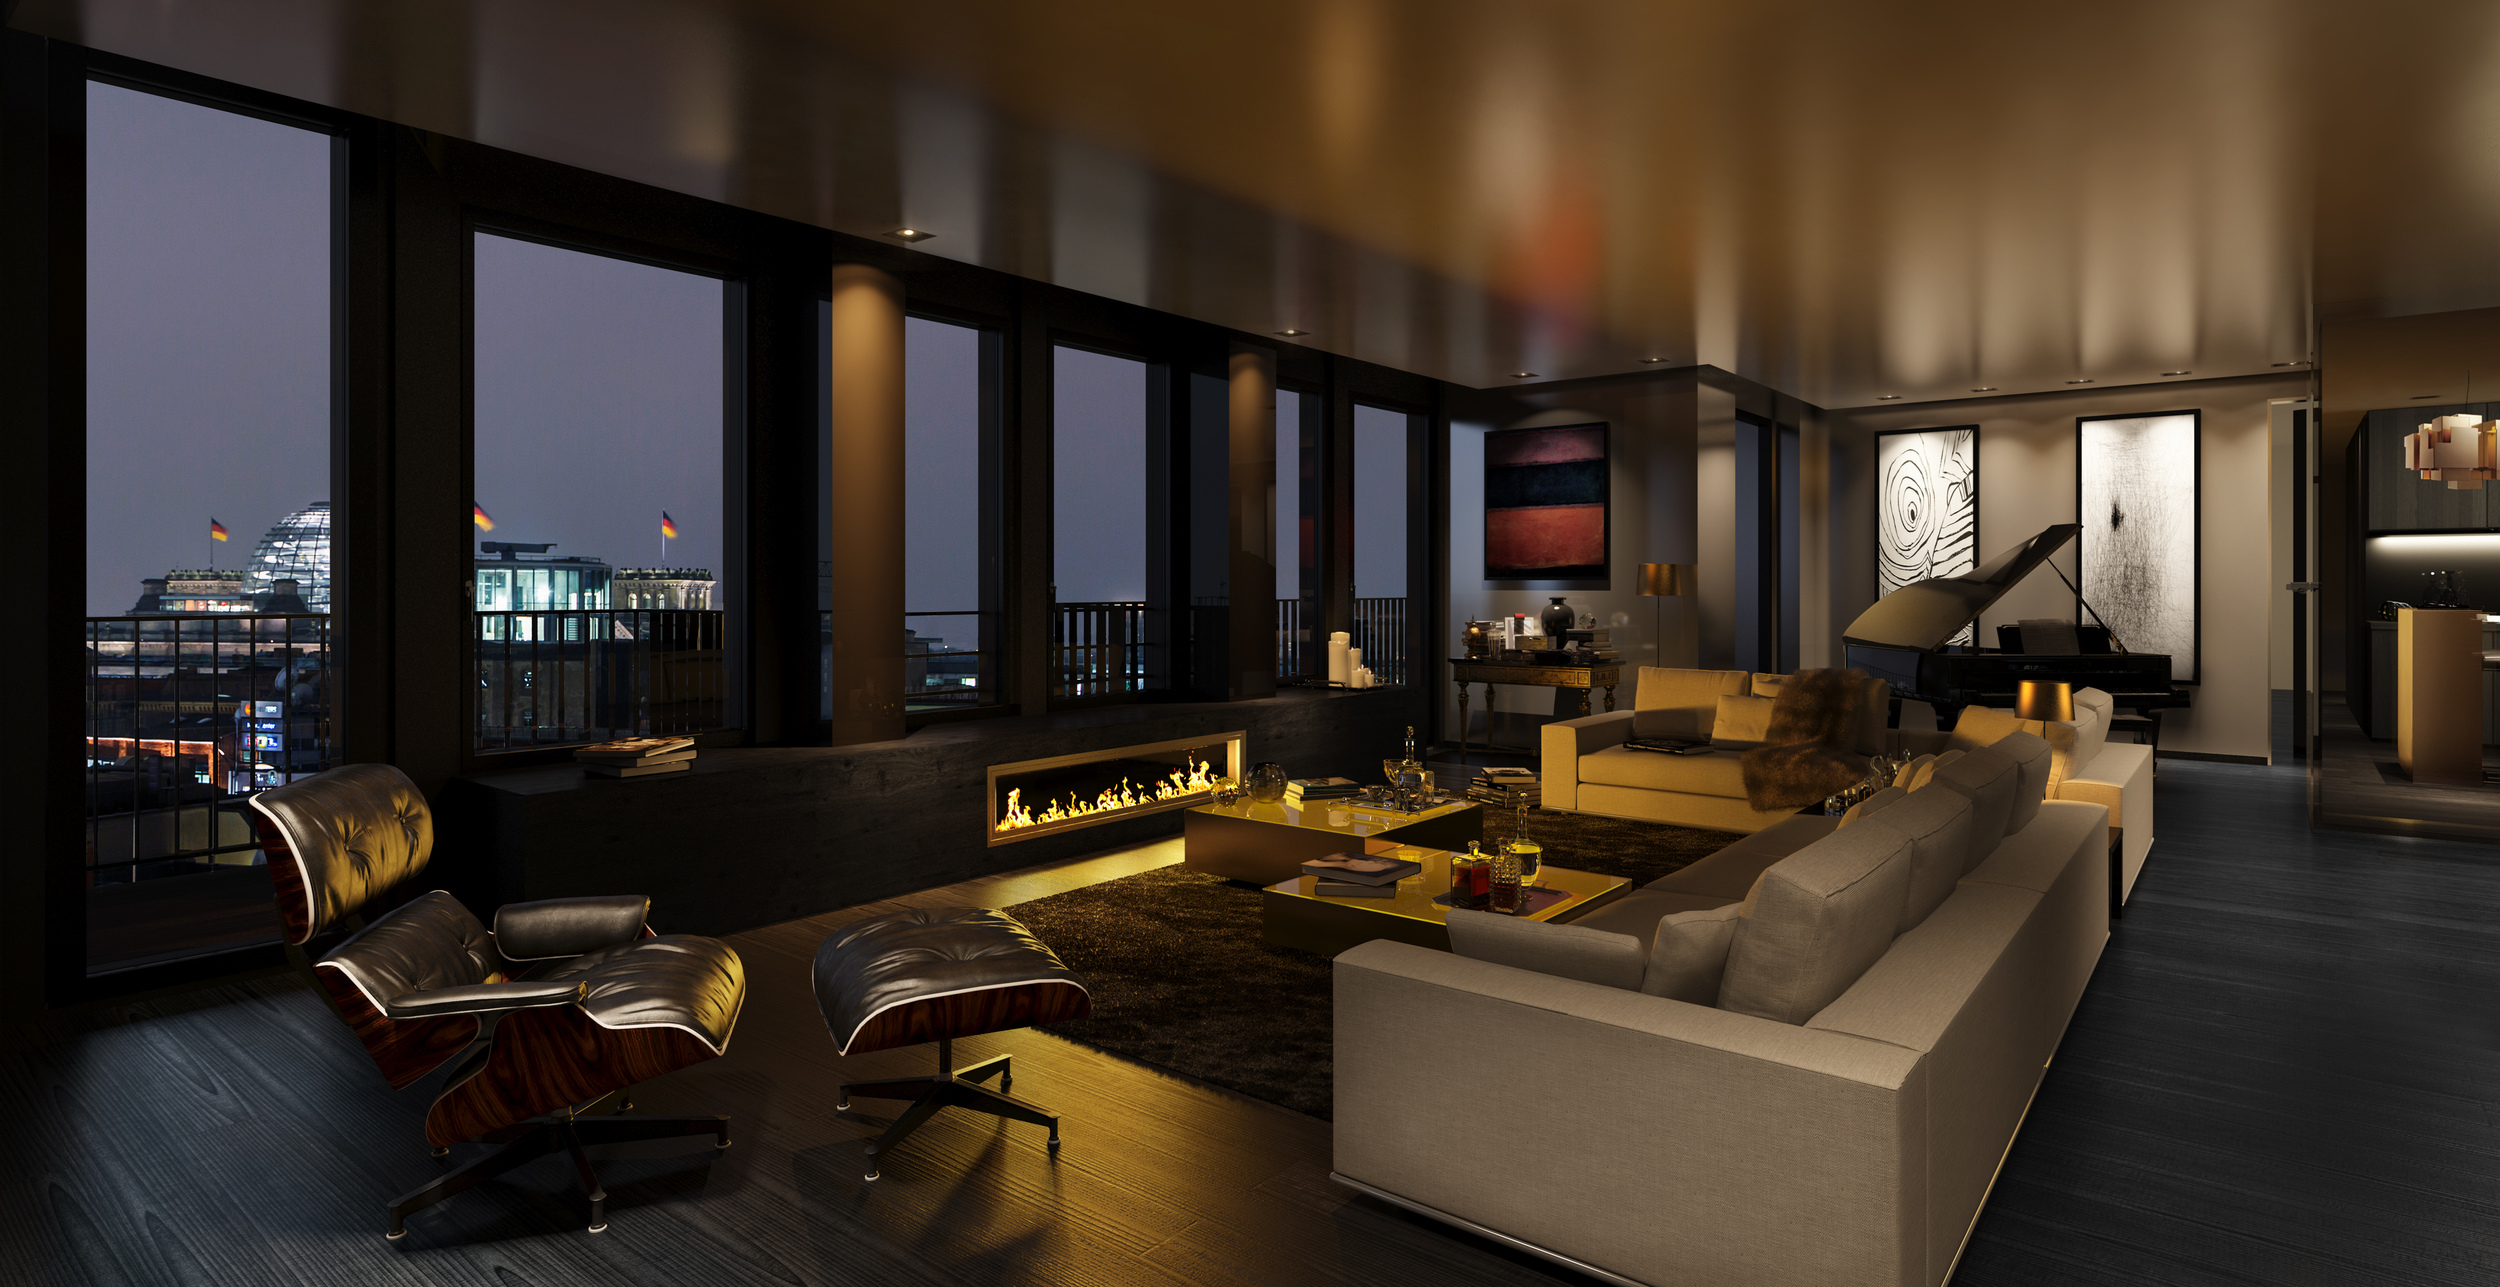 yoo Berlin Penthouse, photo courtesy of Zabel Property Group